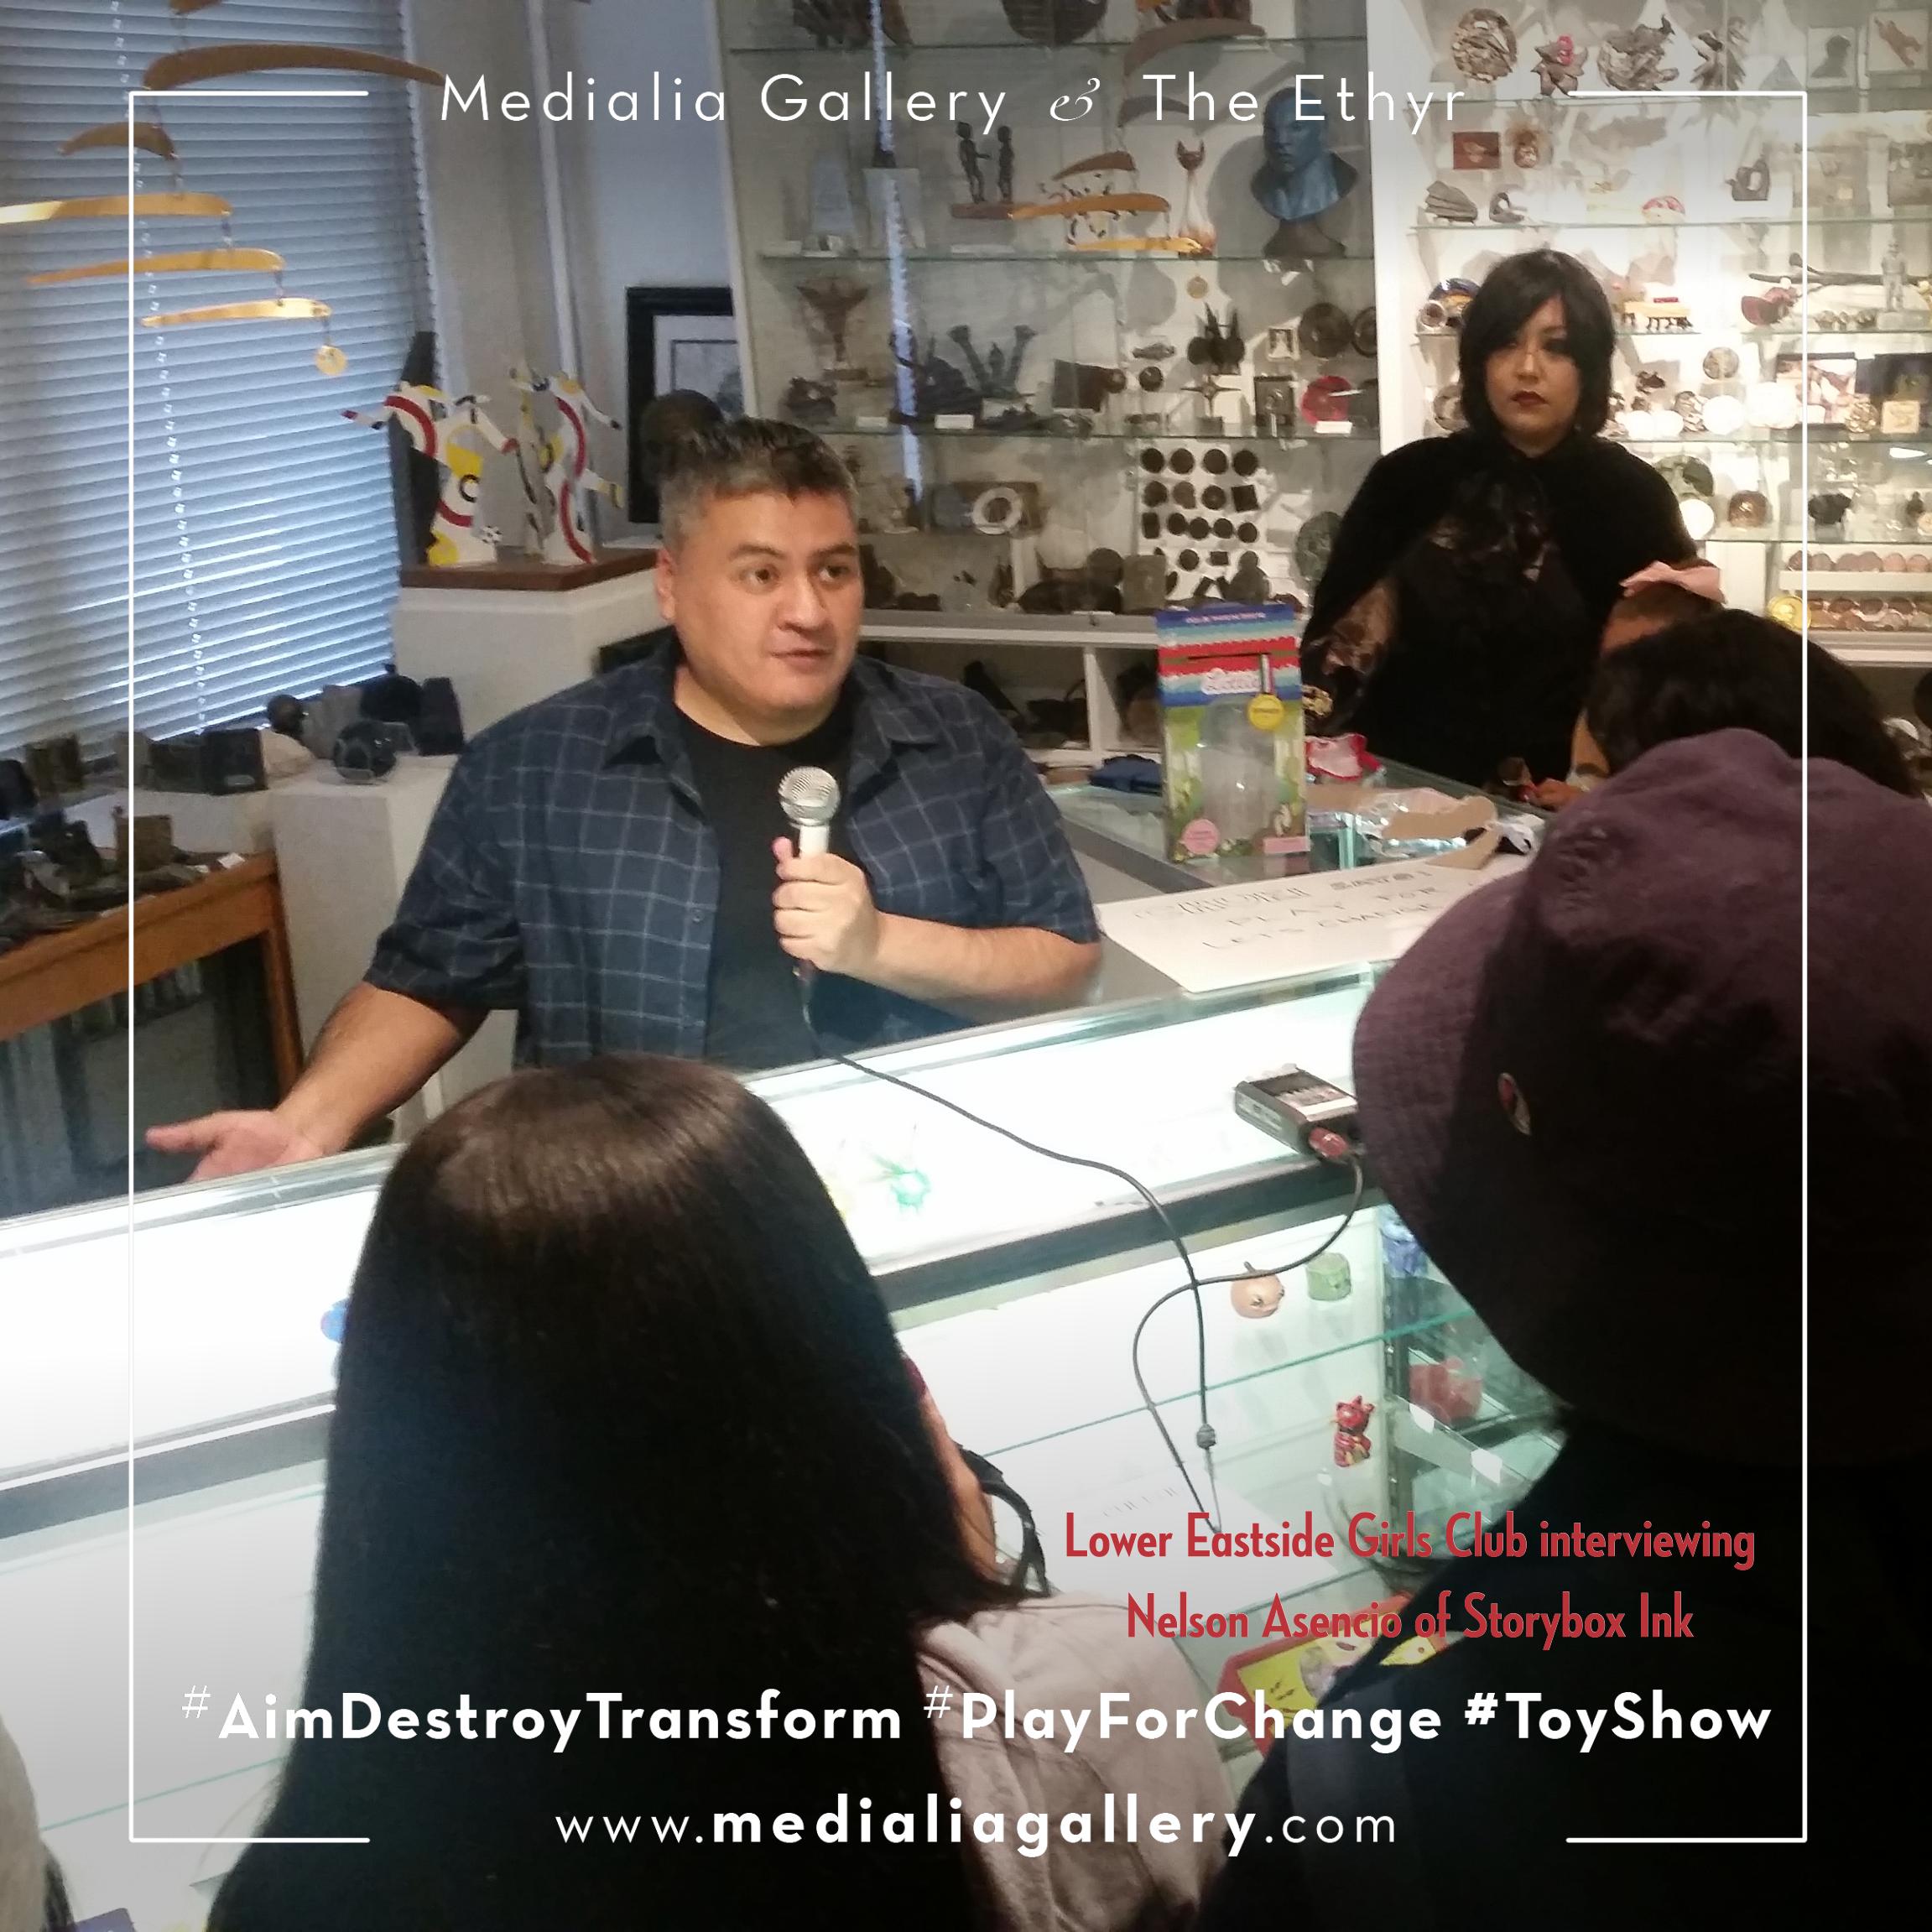 MedialiaGallery_The_Ethyr_AimDestroyTransform_Toy_Show_announcement_Chuki_Nelson_Asencio_Storybox_Ink_Paper_Tales_II_November_2017.jpg.png